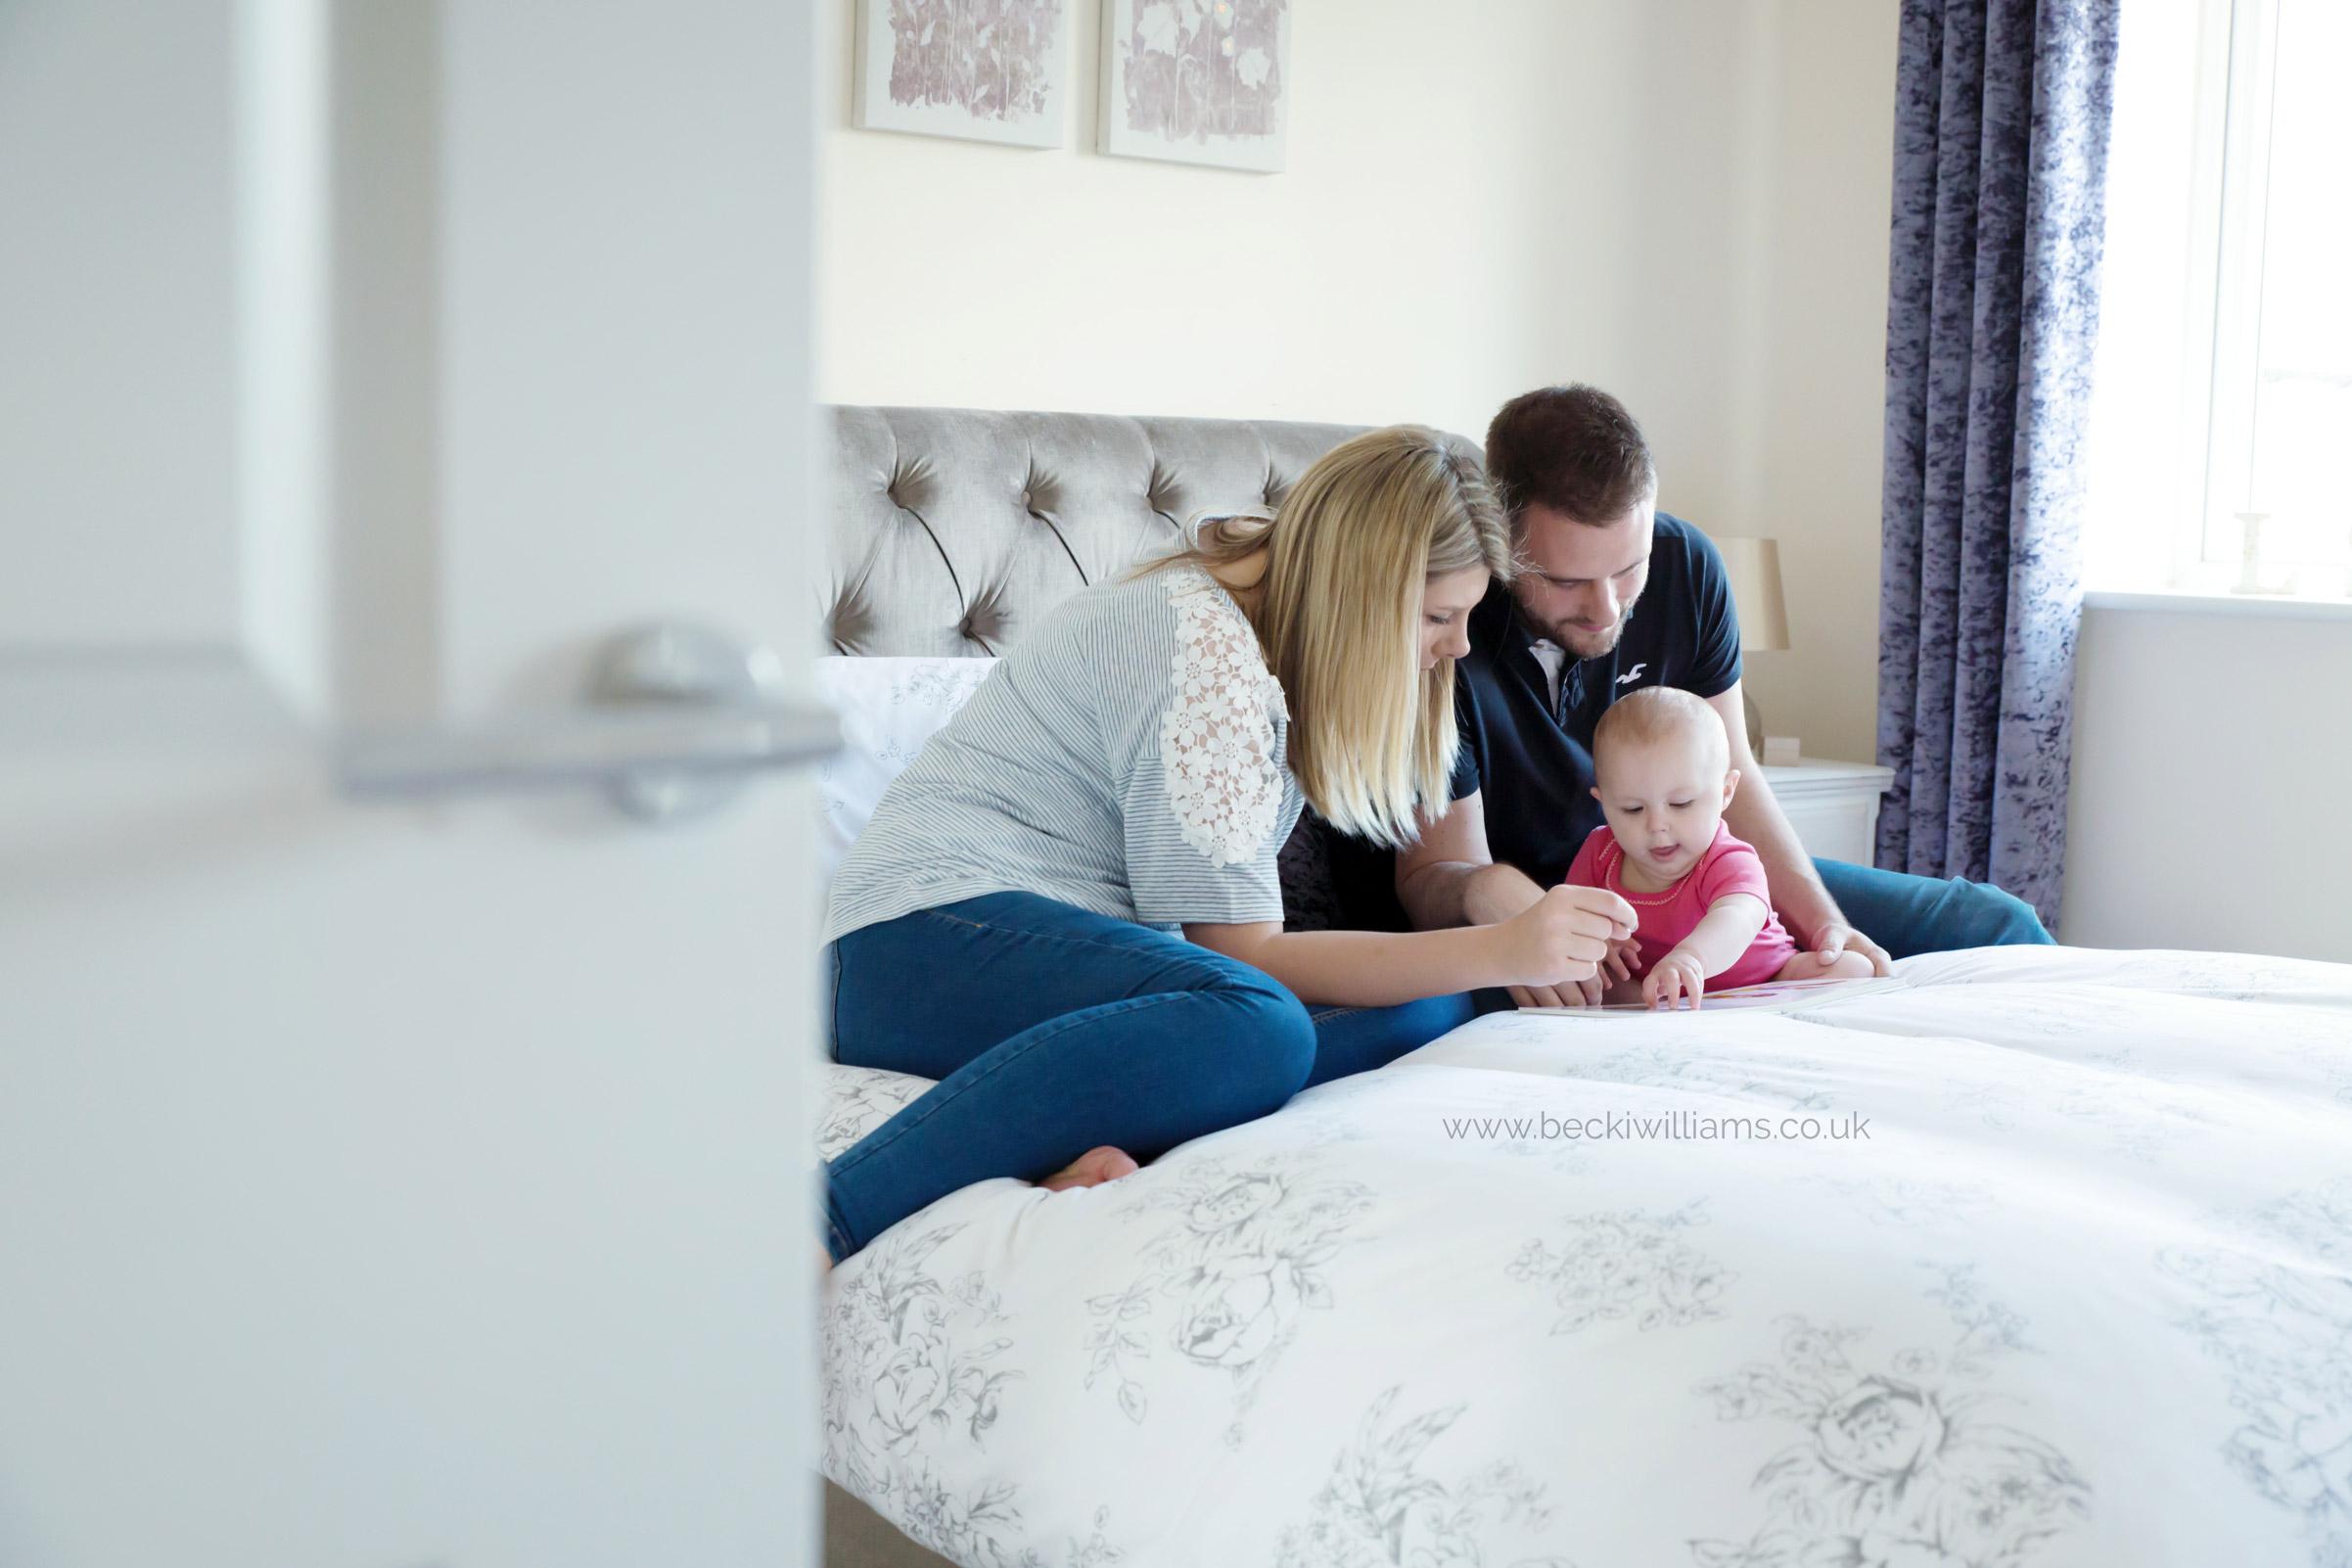 baby-photographer-hemel-hempstead-1-year-old-with-family